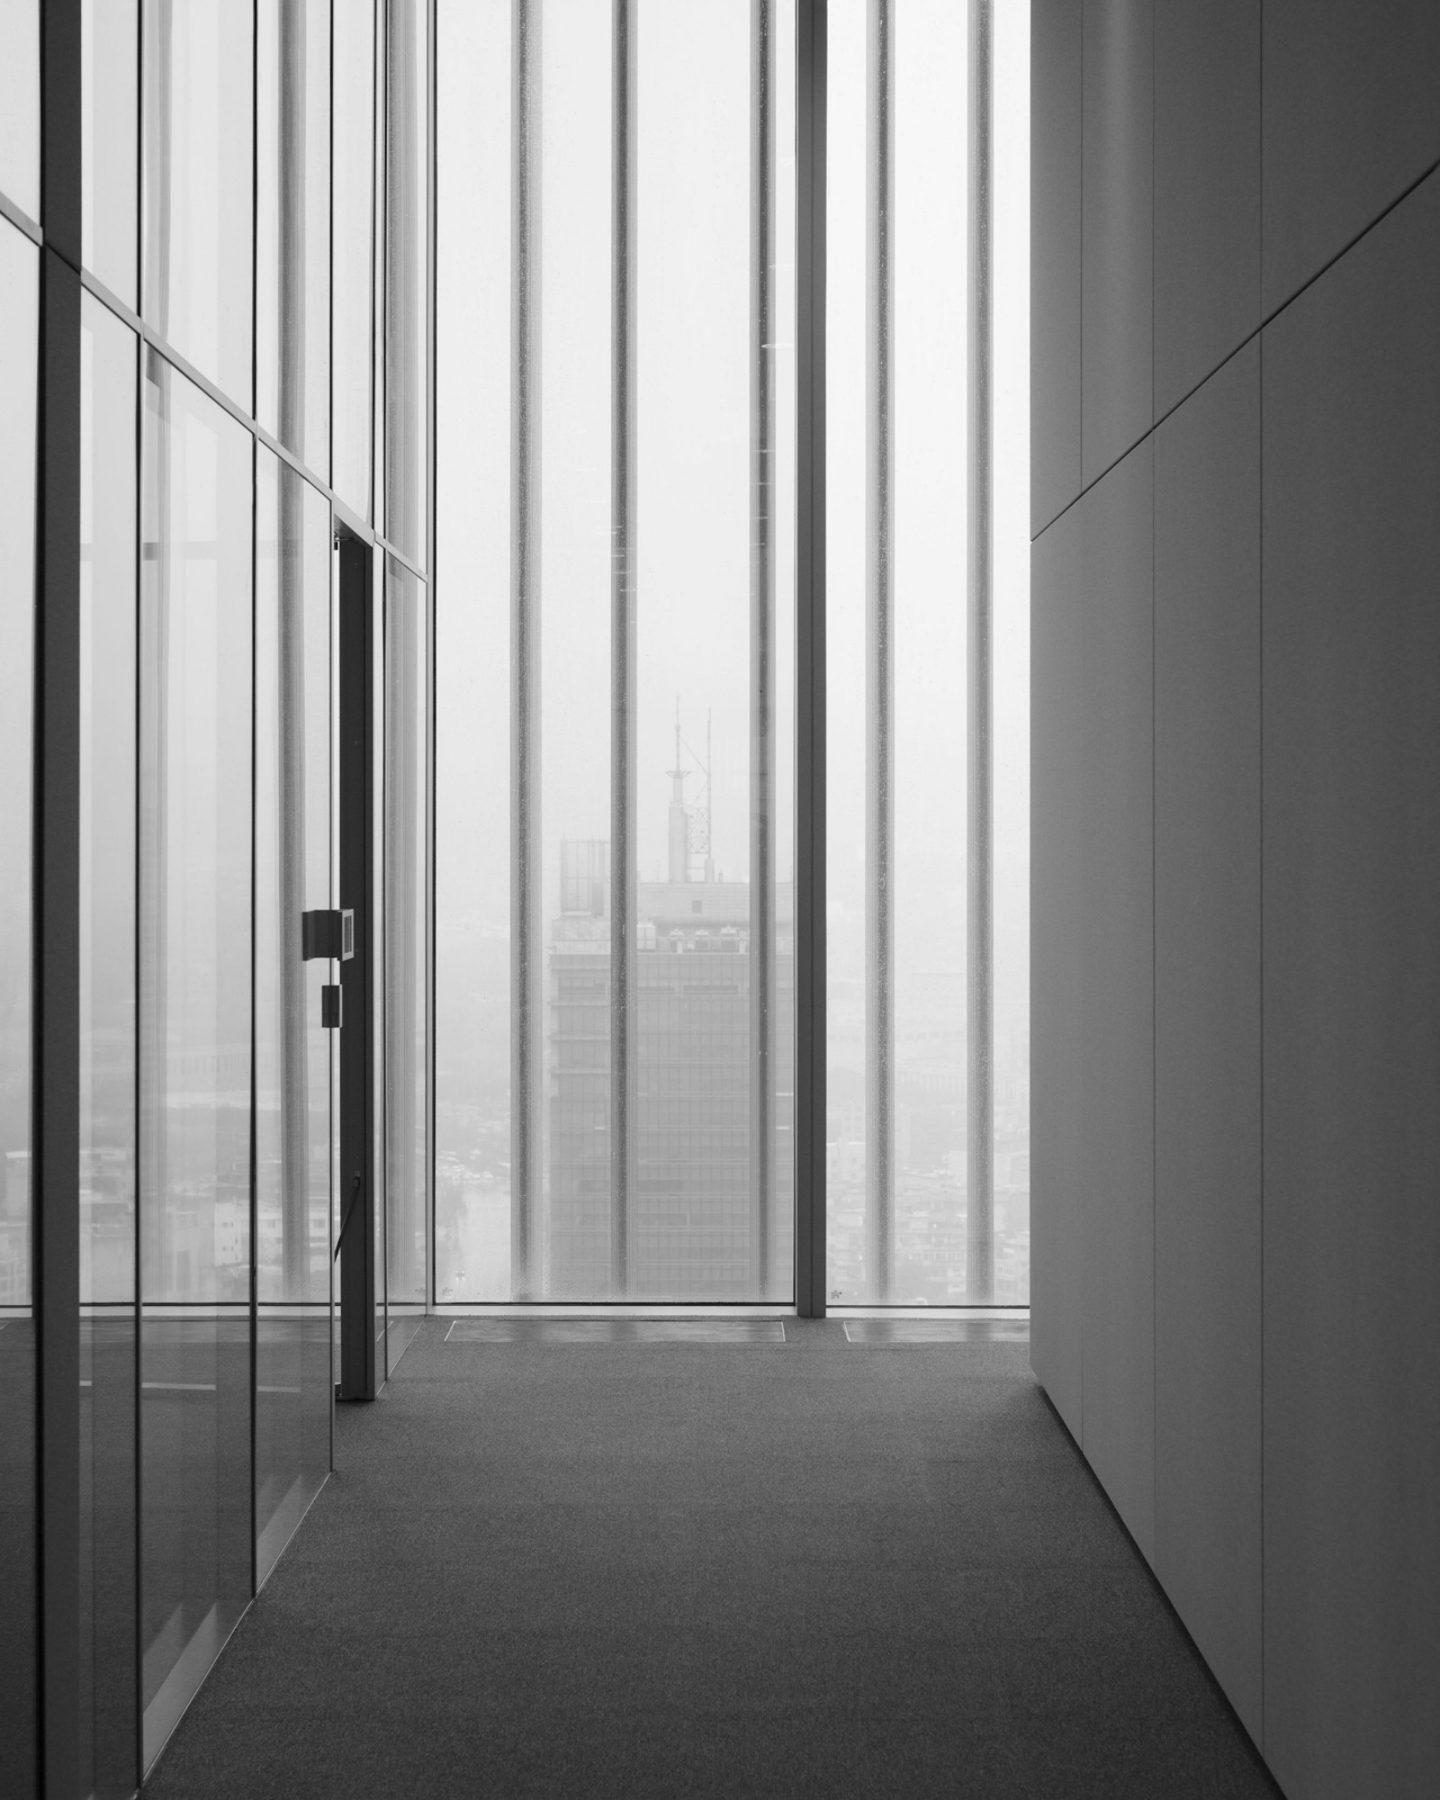 IGNANT-Photography-Michael-Gessner-Masse-17